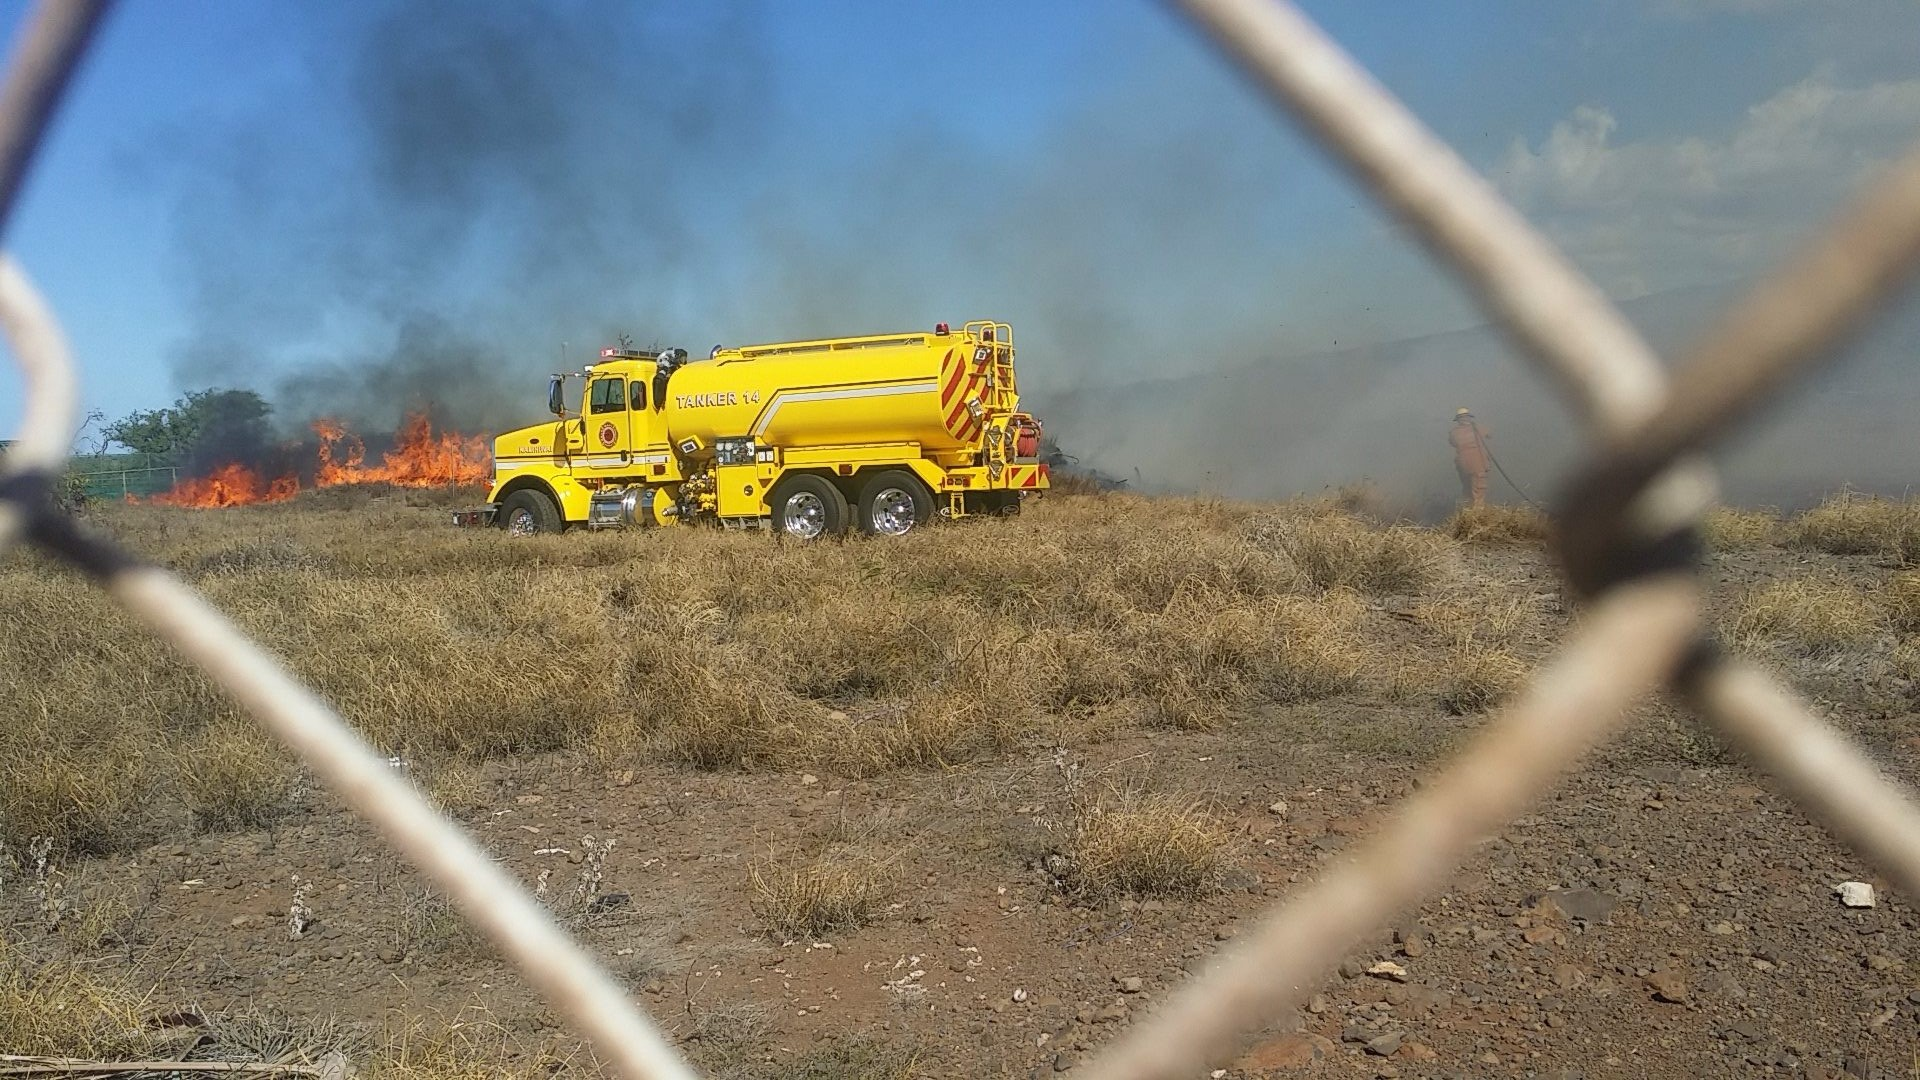 Kīhei fire, Oct. 20, 2015. Photo credit: Julia Toro.